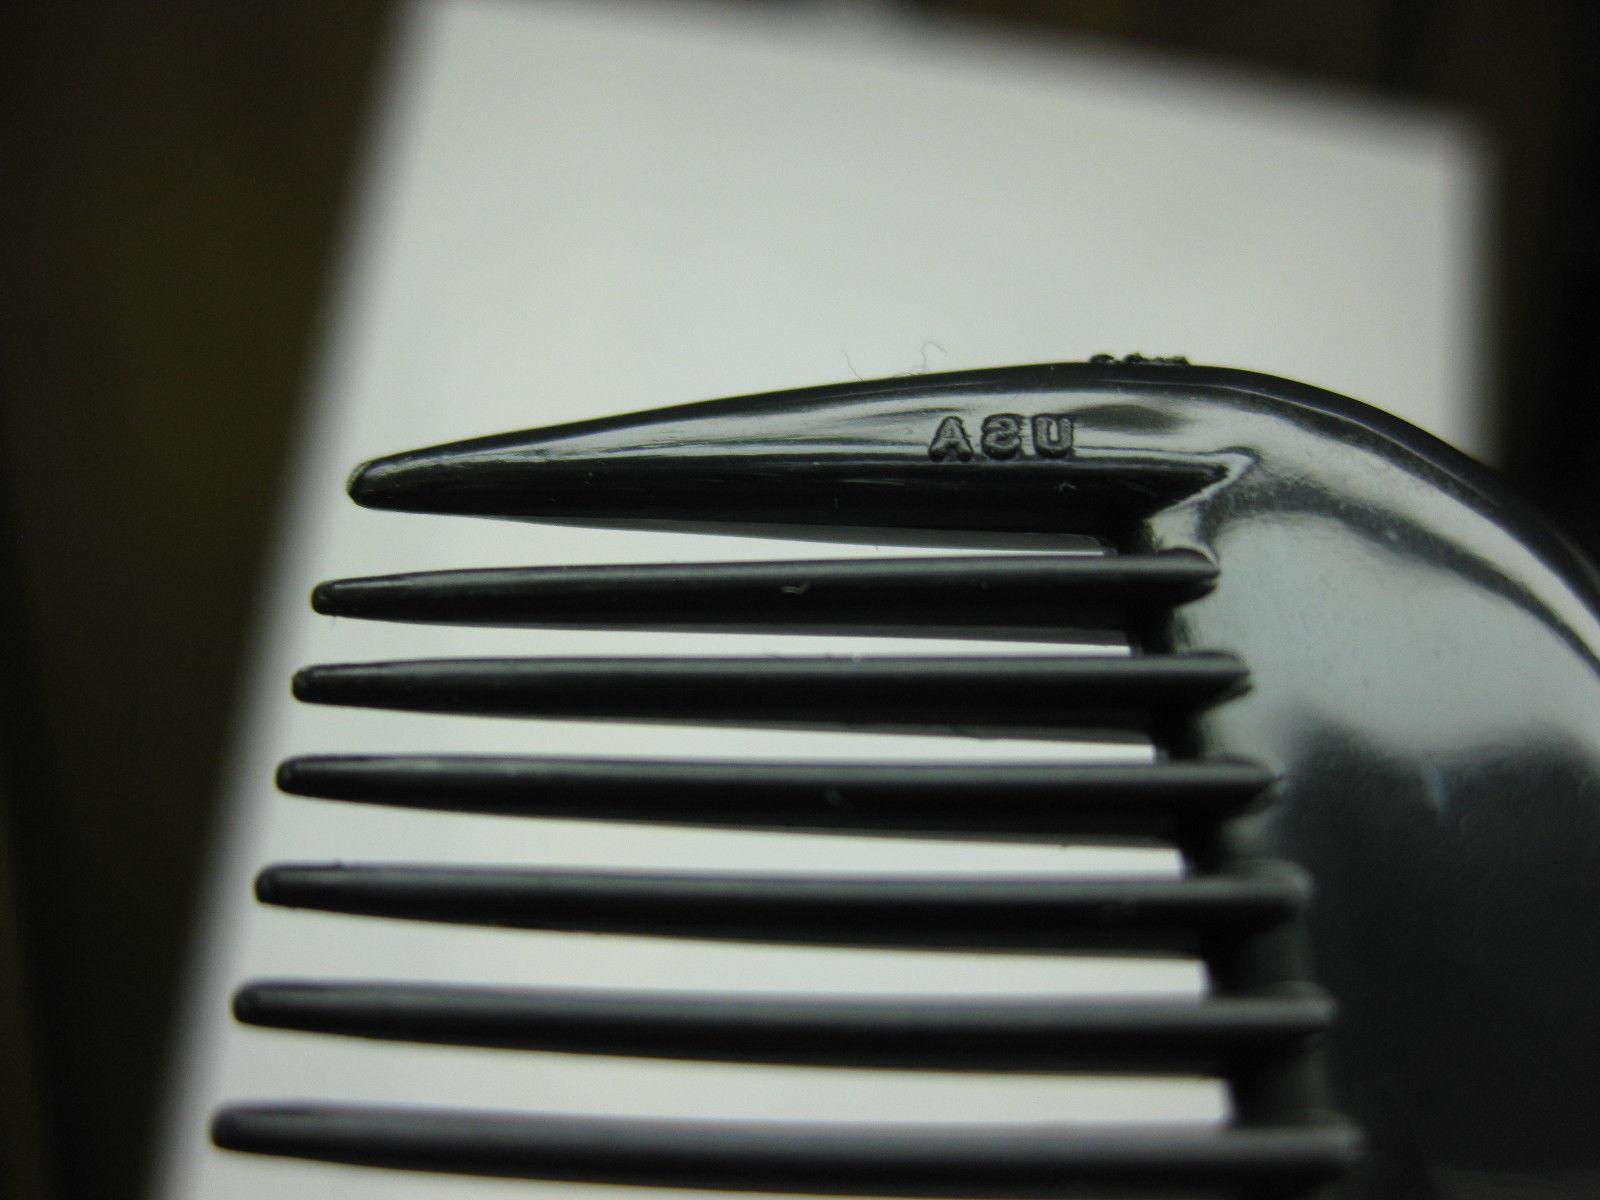 12 UNBREAKABLE BLACK PLASTIC POCKET HAIR MADE